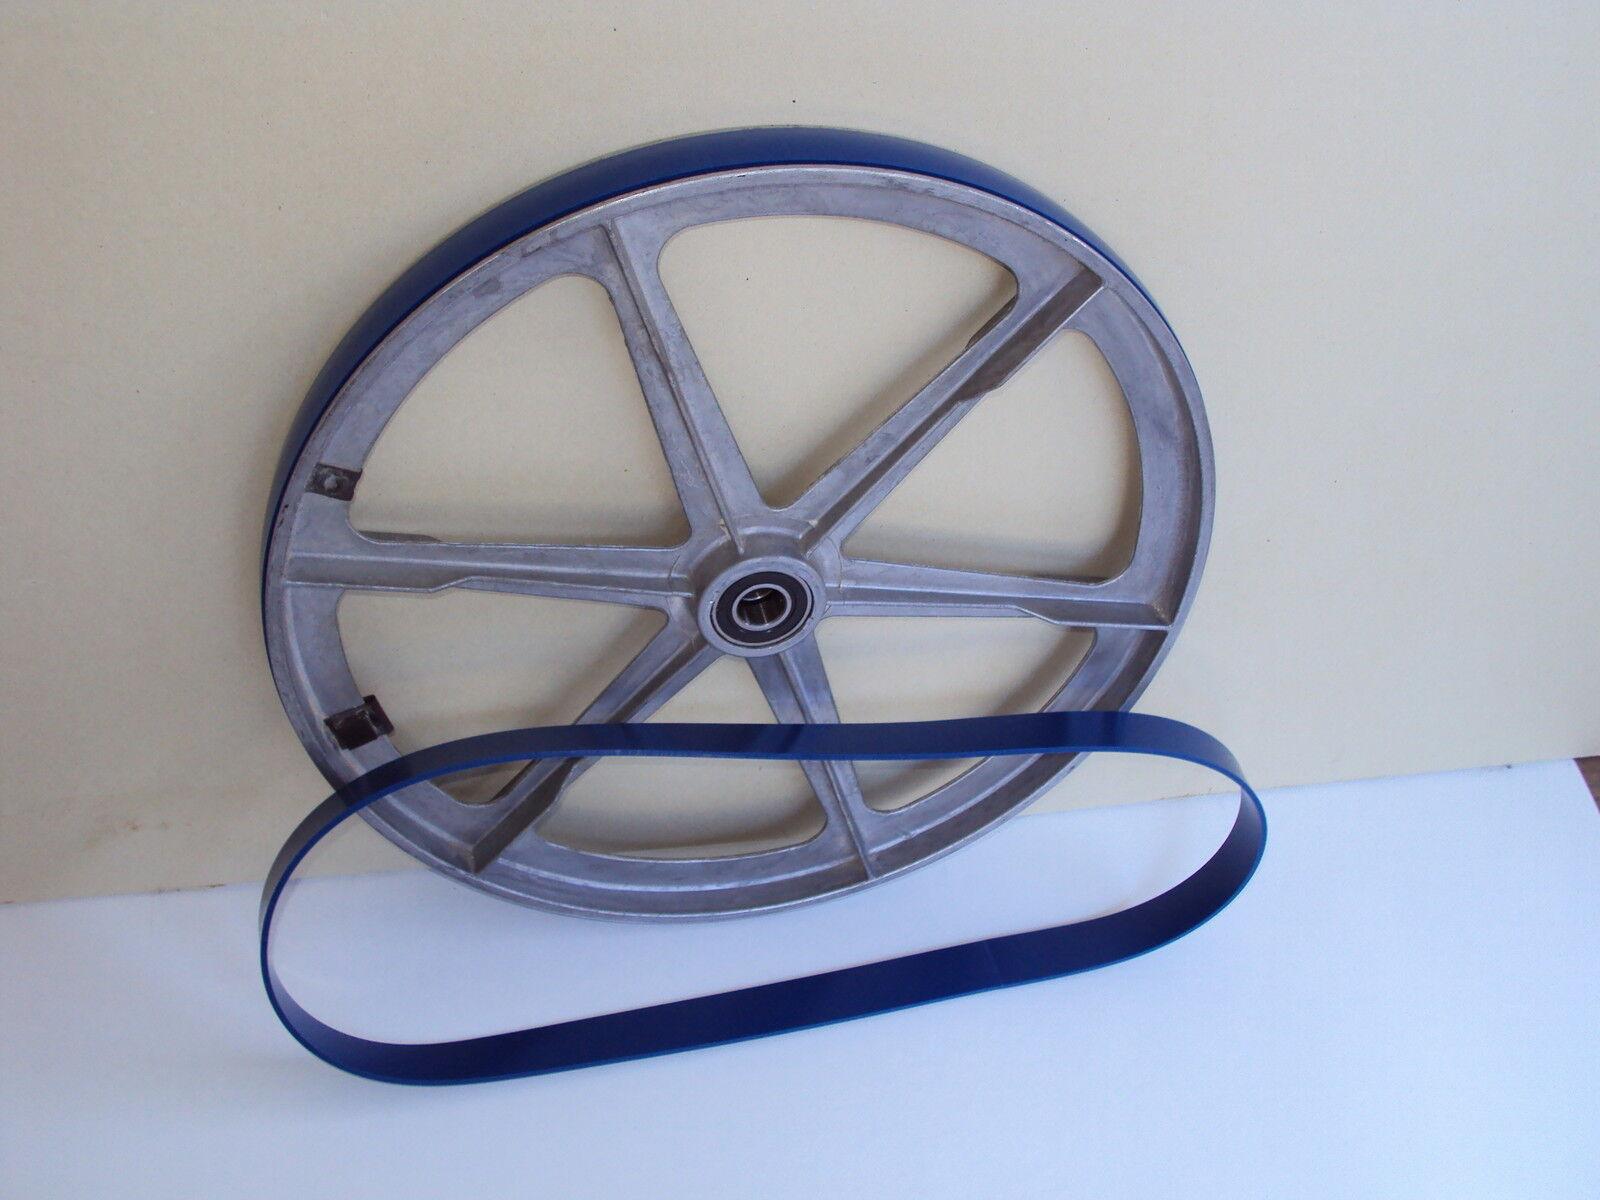 BLUE MAX ULTRA DUTY .125 URETHANE BANDSAW TIRES FOR CRAFTSMAN 113.243310 BANDSAW